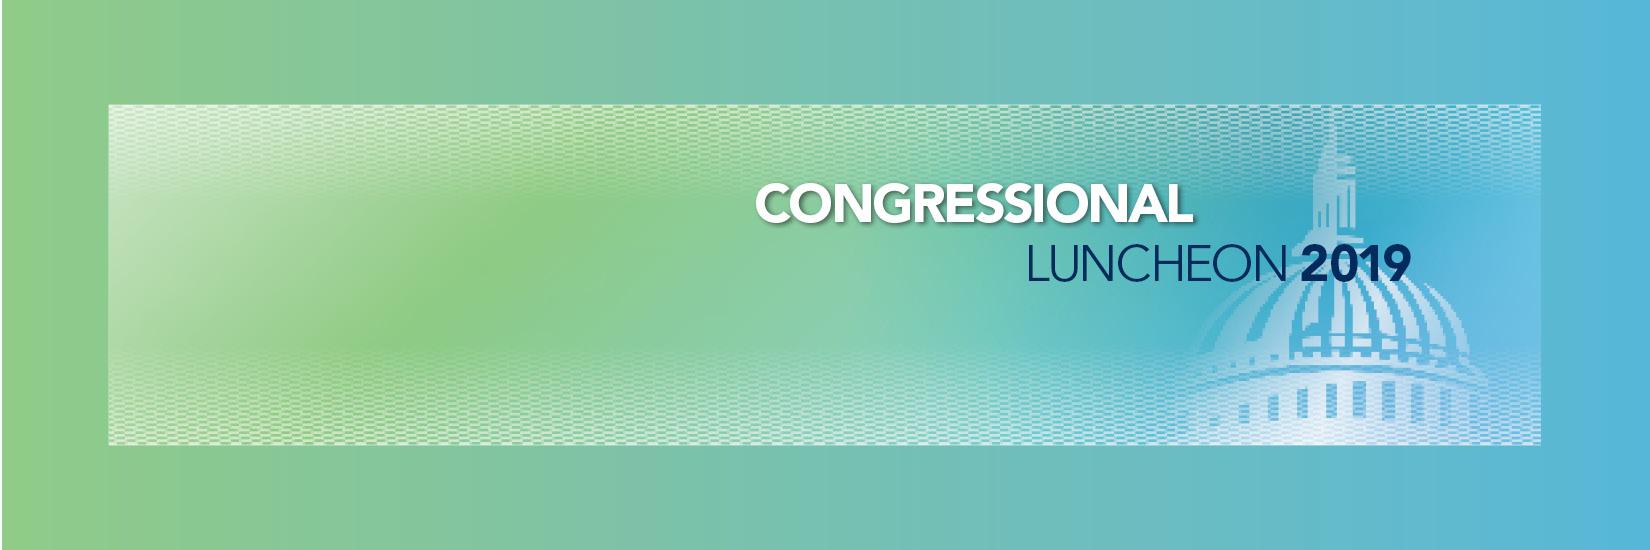 Congressional-Banner.jpg